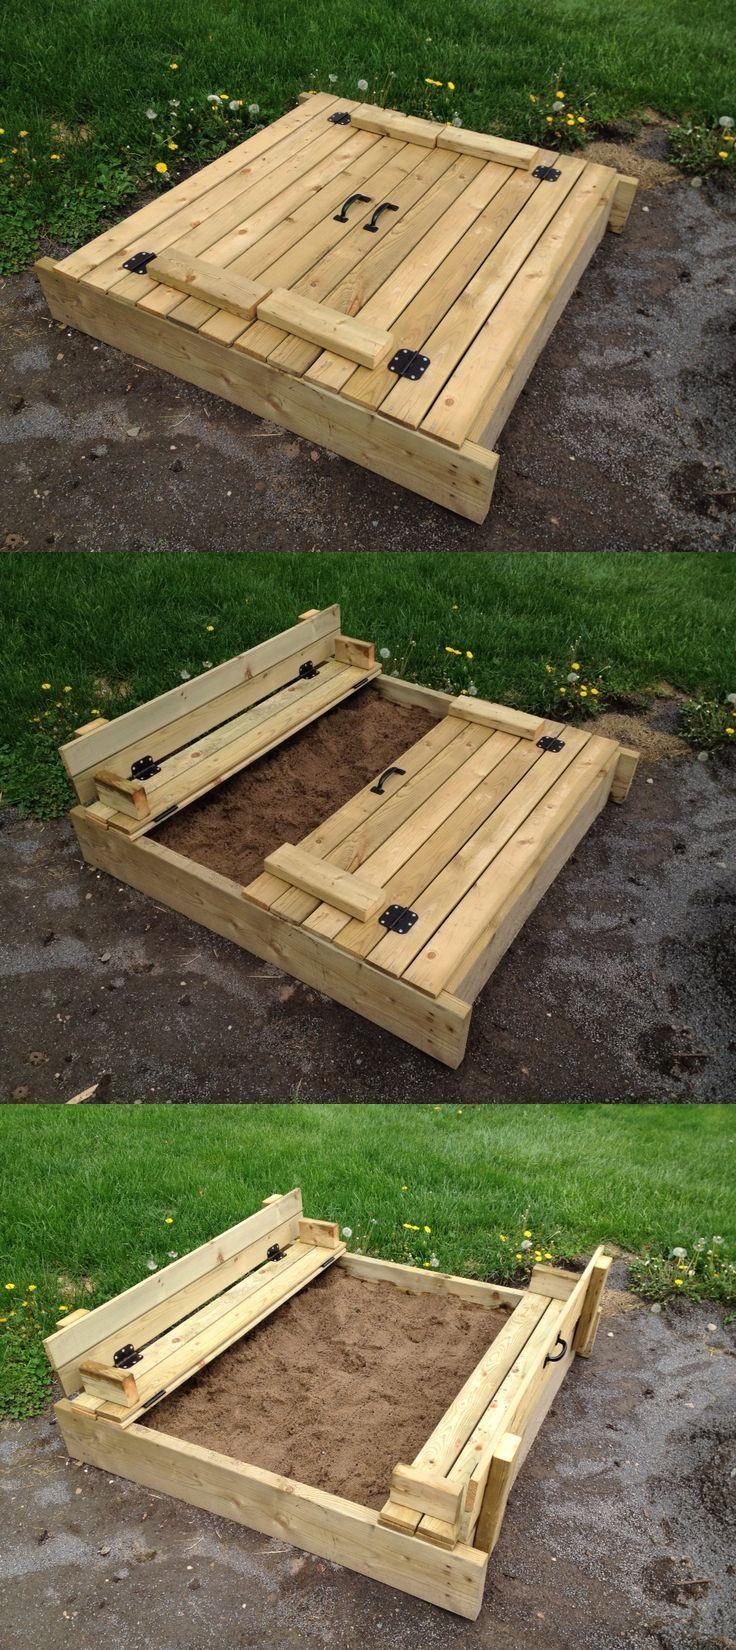 Homemade patio furniture ideas - Carr De Sable Sandbox Home Made Avec Couvercle Et Banc Rabatable Folding